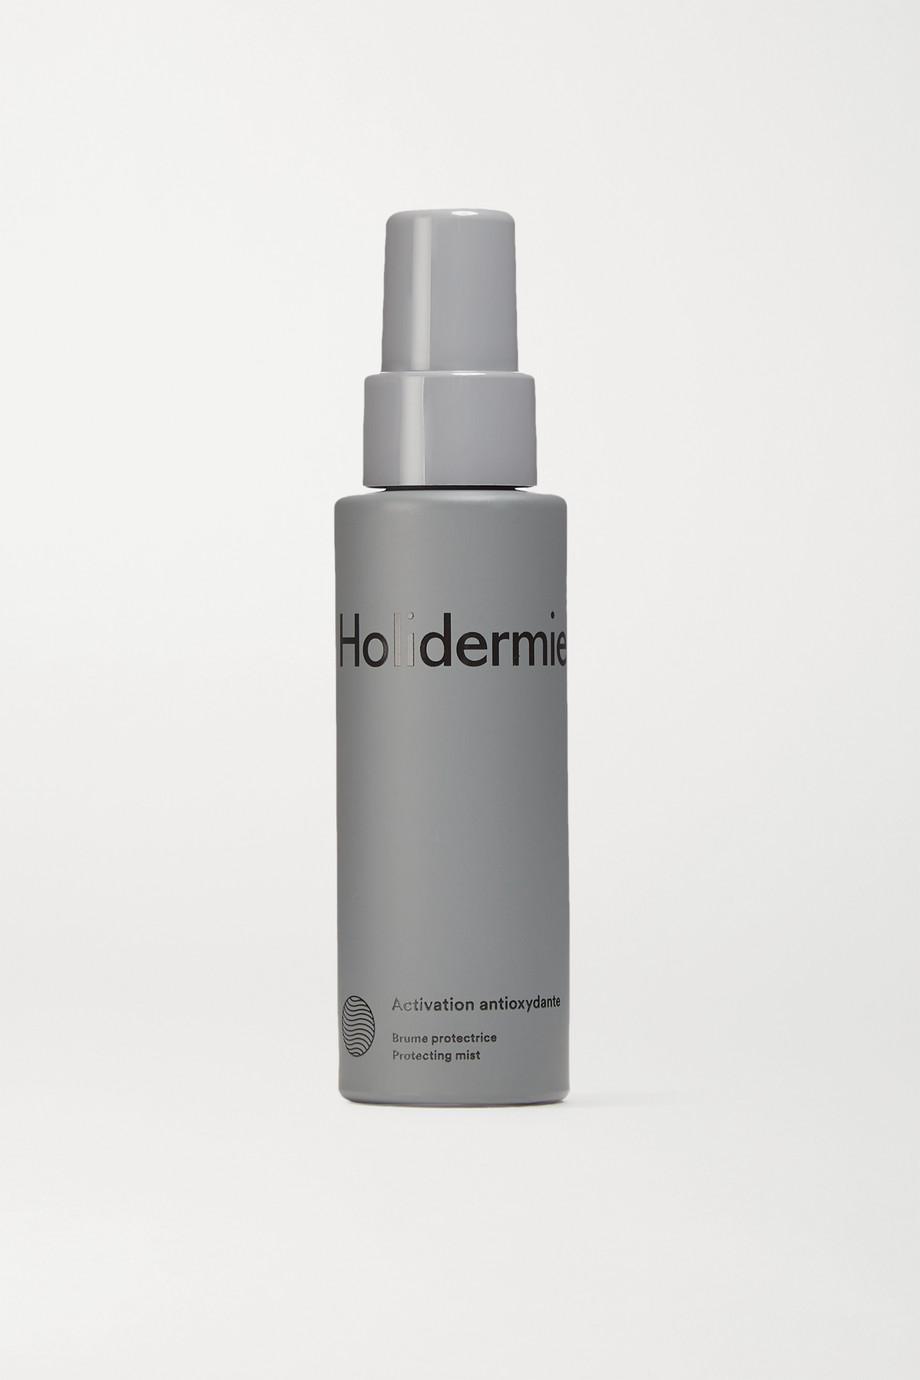 Holidermie Activation Antioxydante Protecting Mist, 30 ml – Gesichtsspray